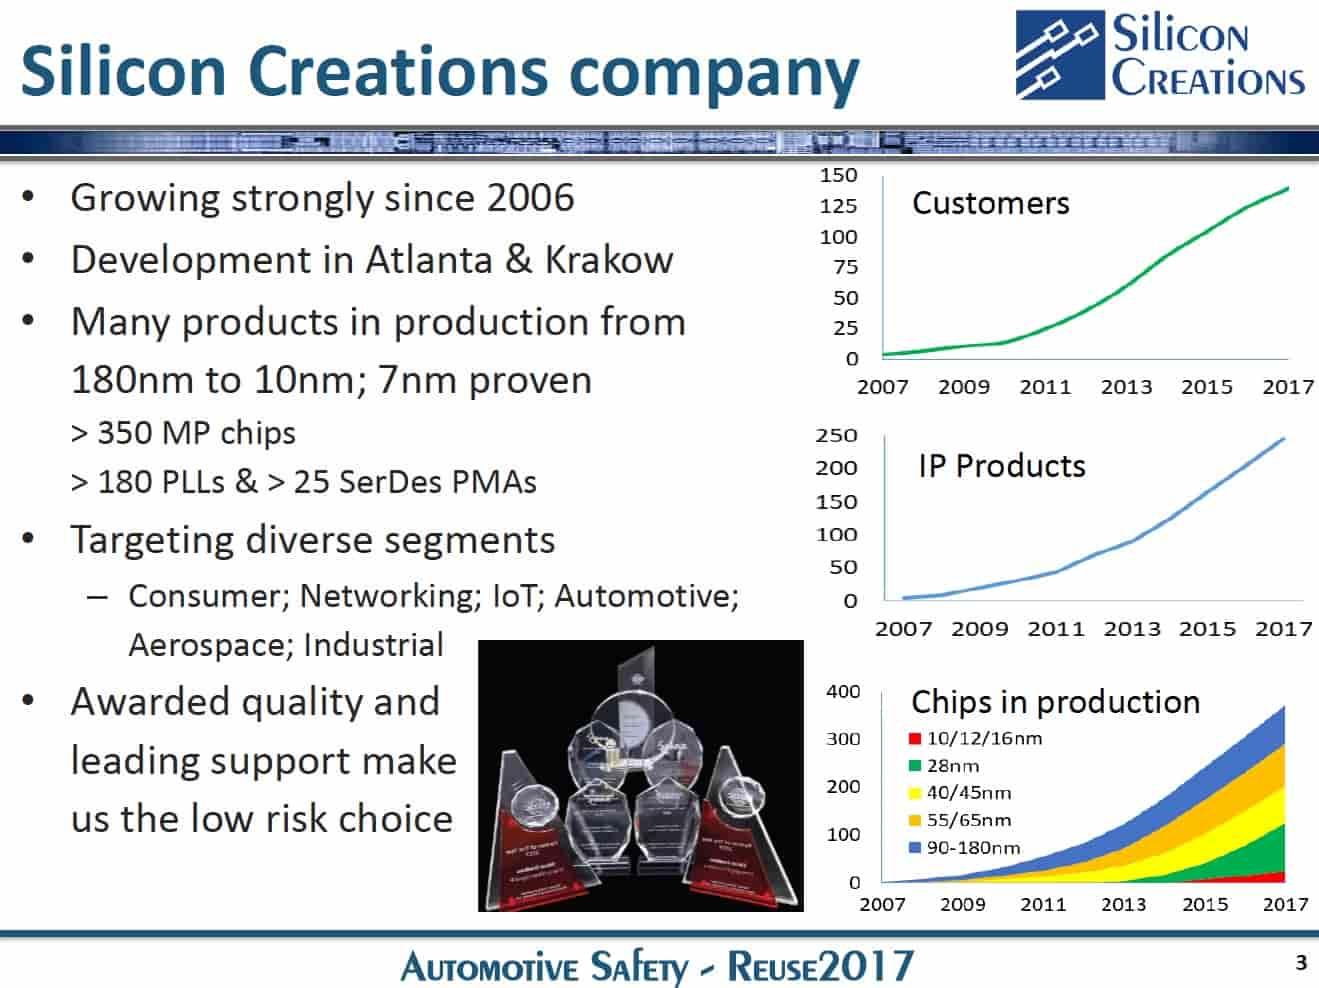 21026-silicon-creations-iso26262-min.jpg